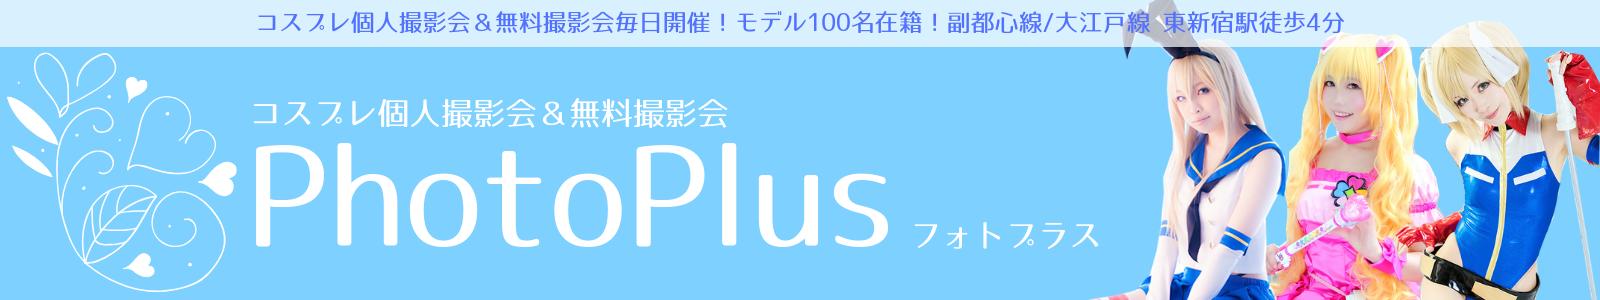 PhotoPlus撮影会